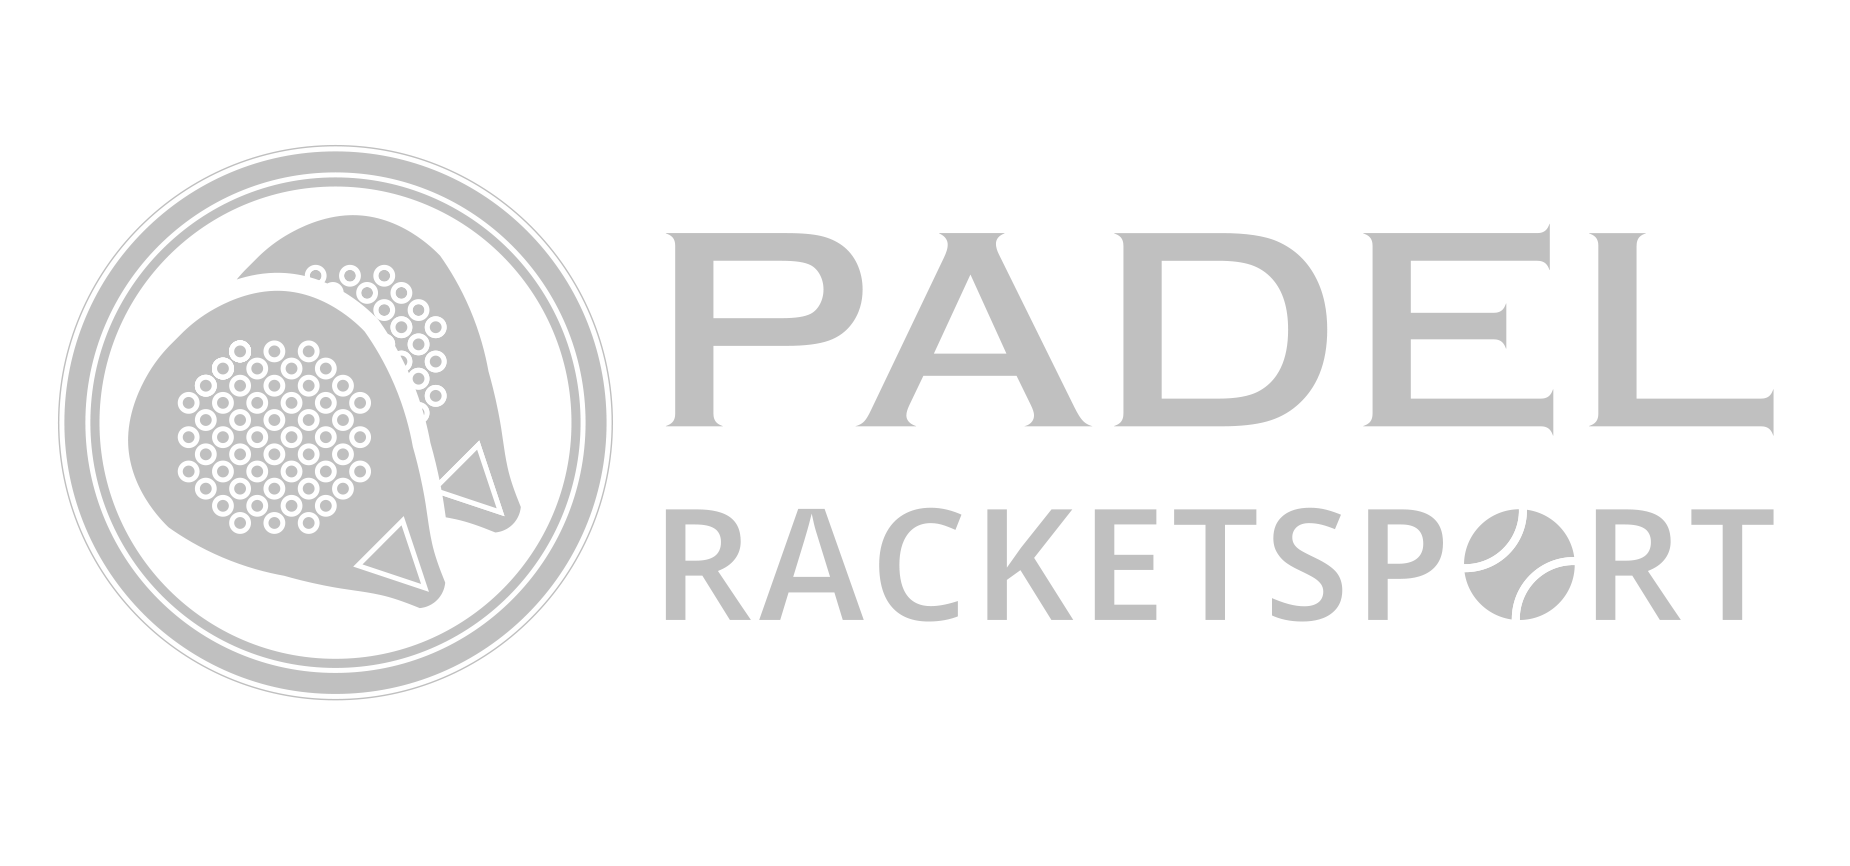 Padel logo